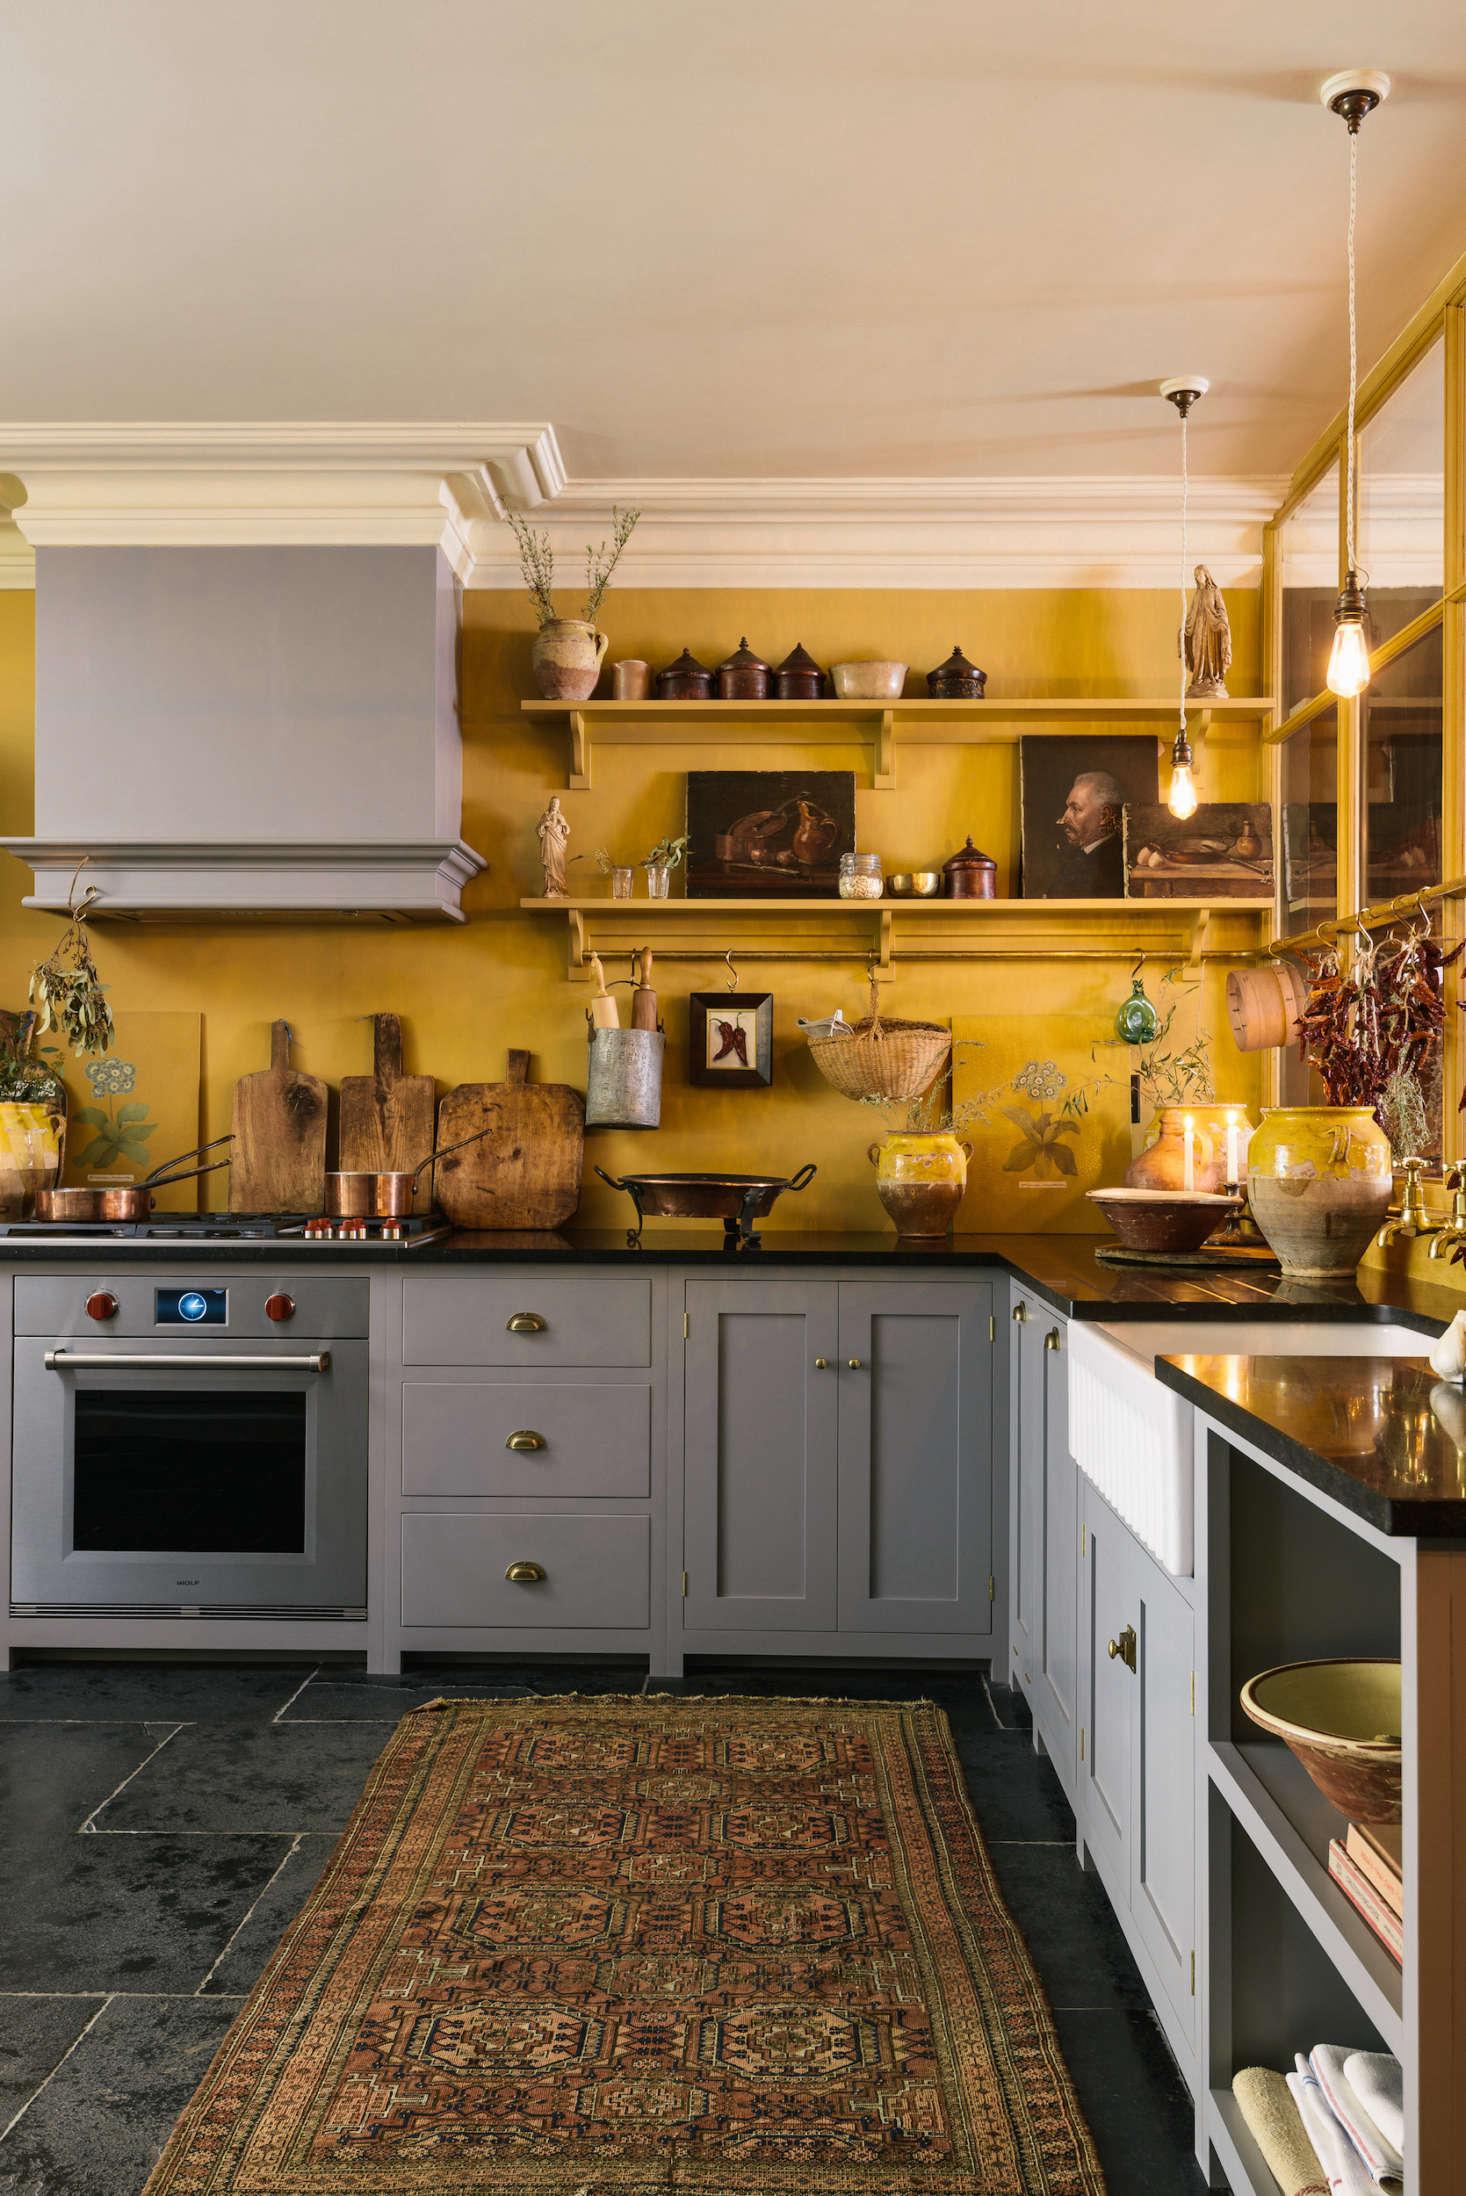 UK kitchen company deVol&#8